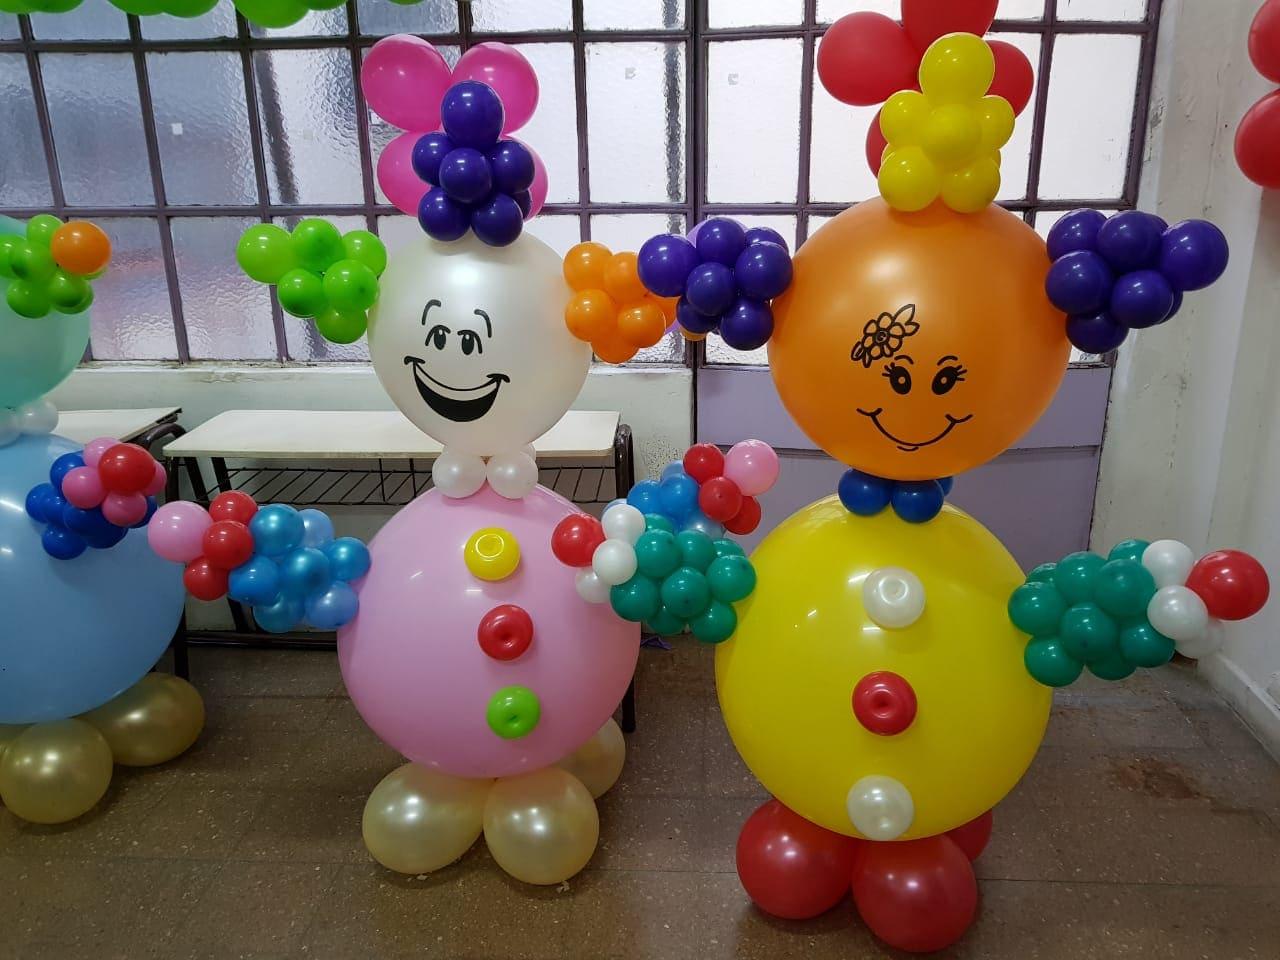 Imagen de Payasines Descripcion: Payasos gigante con piñata de globos para cumpleaños,eventos infantiles.